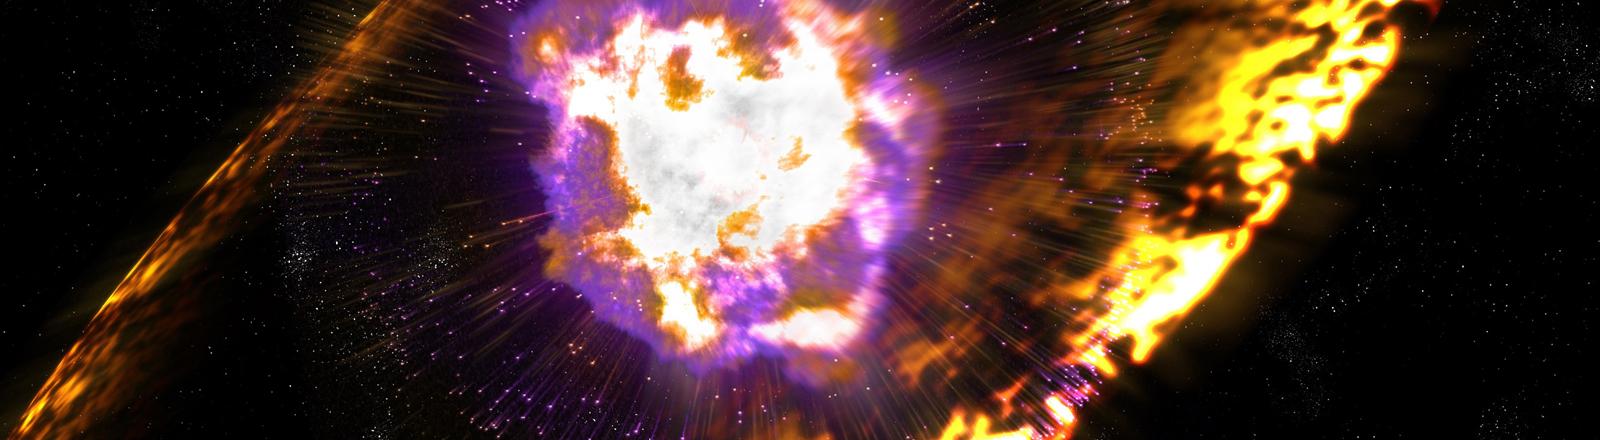 Supernova (Symbolbild)